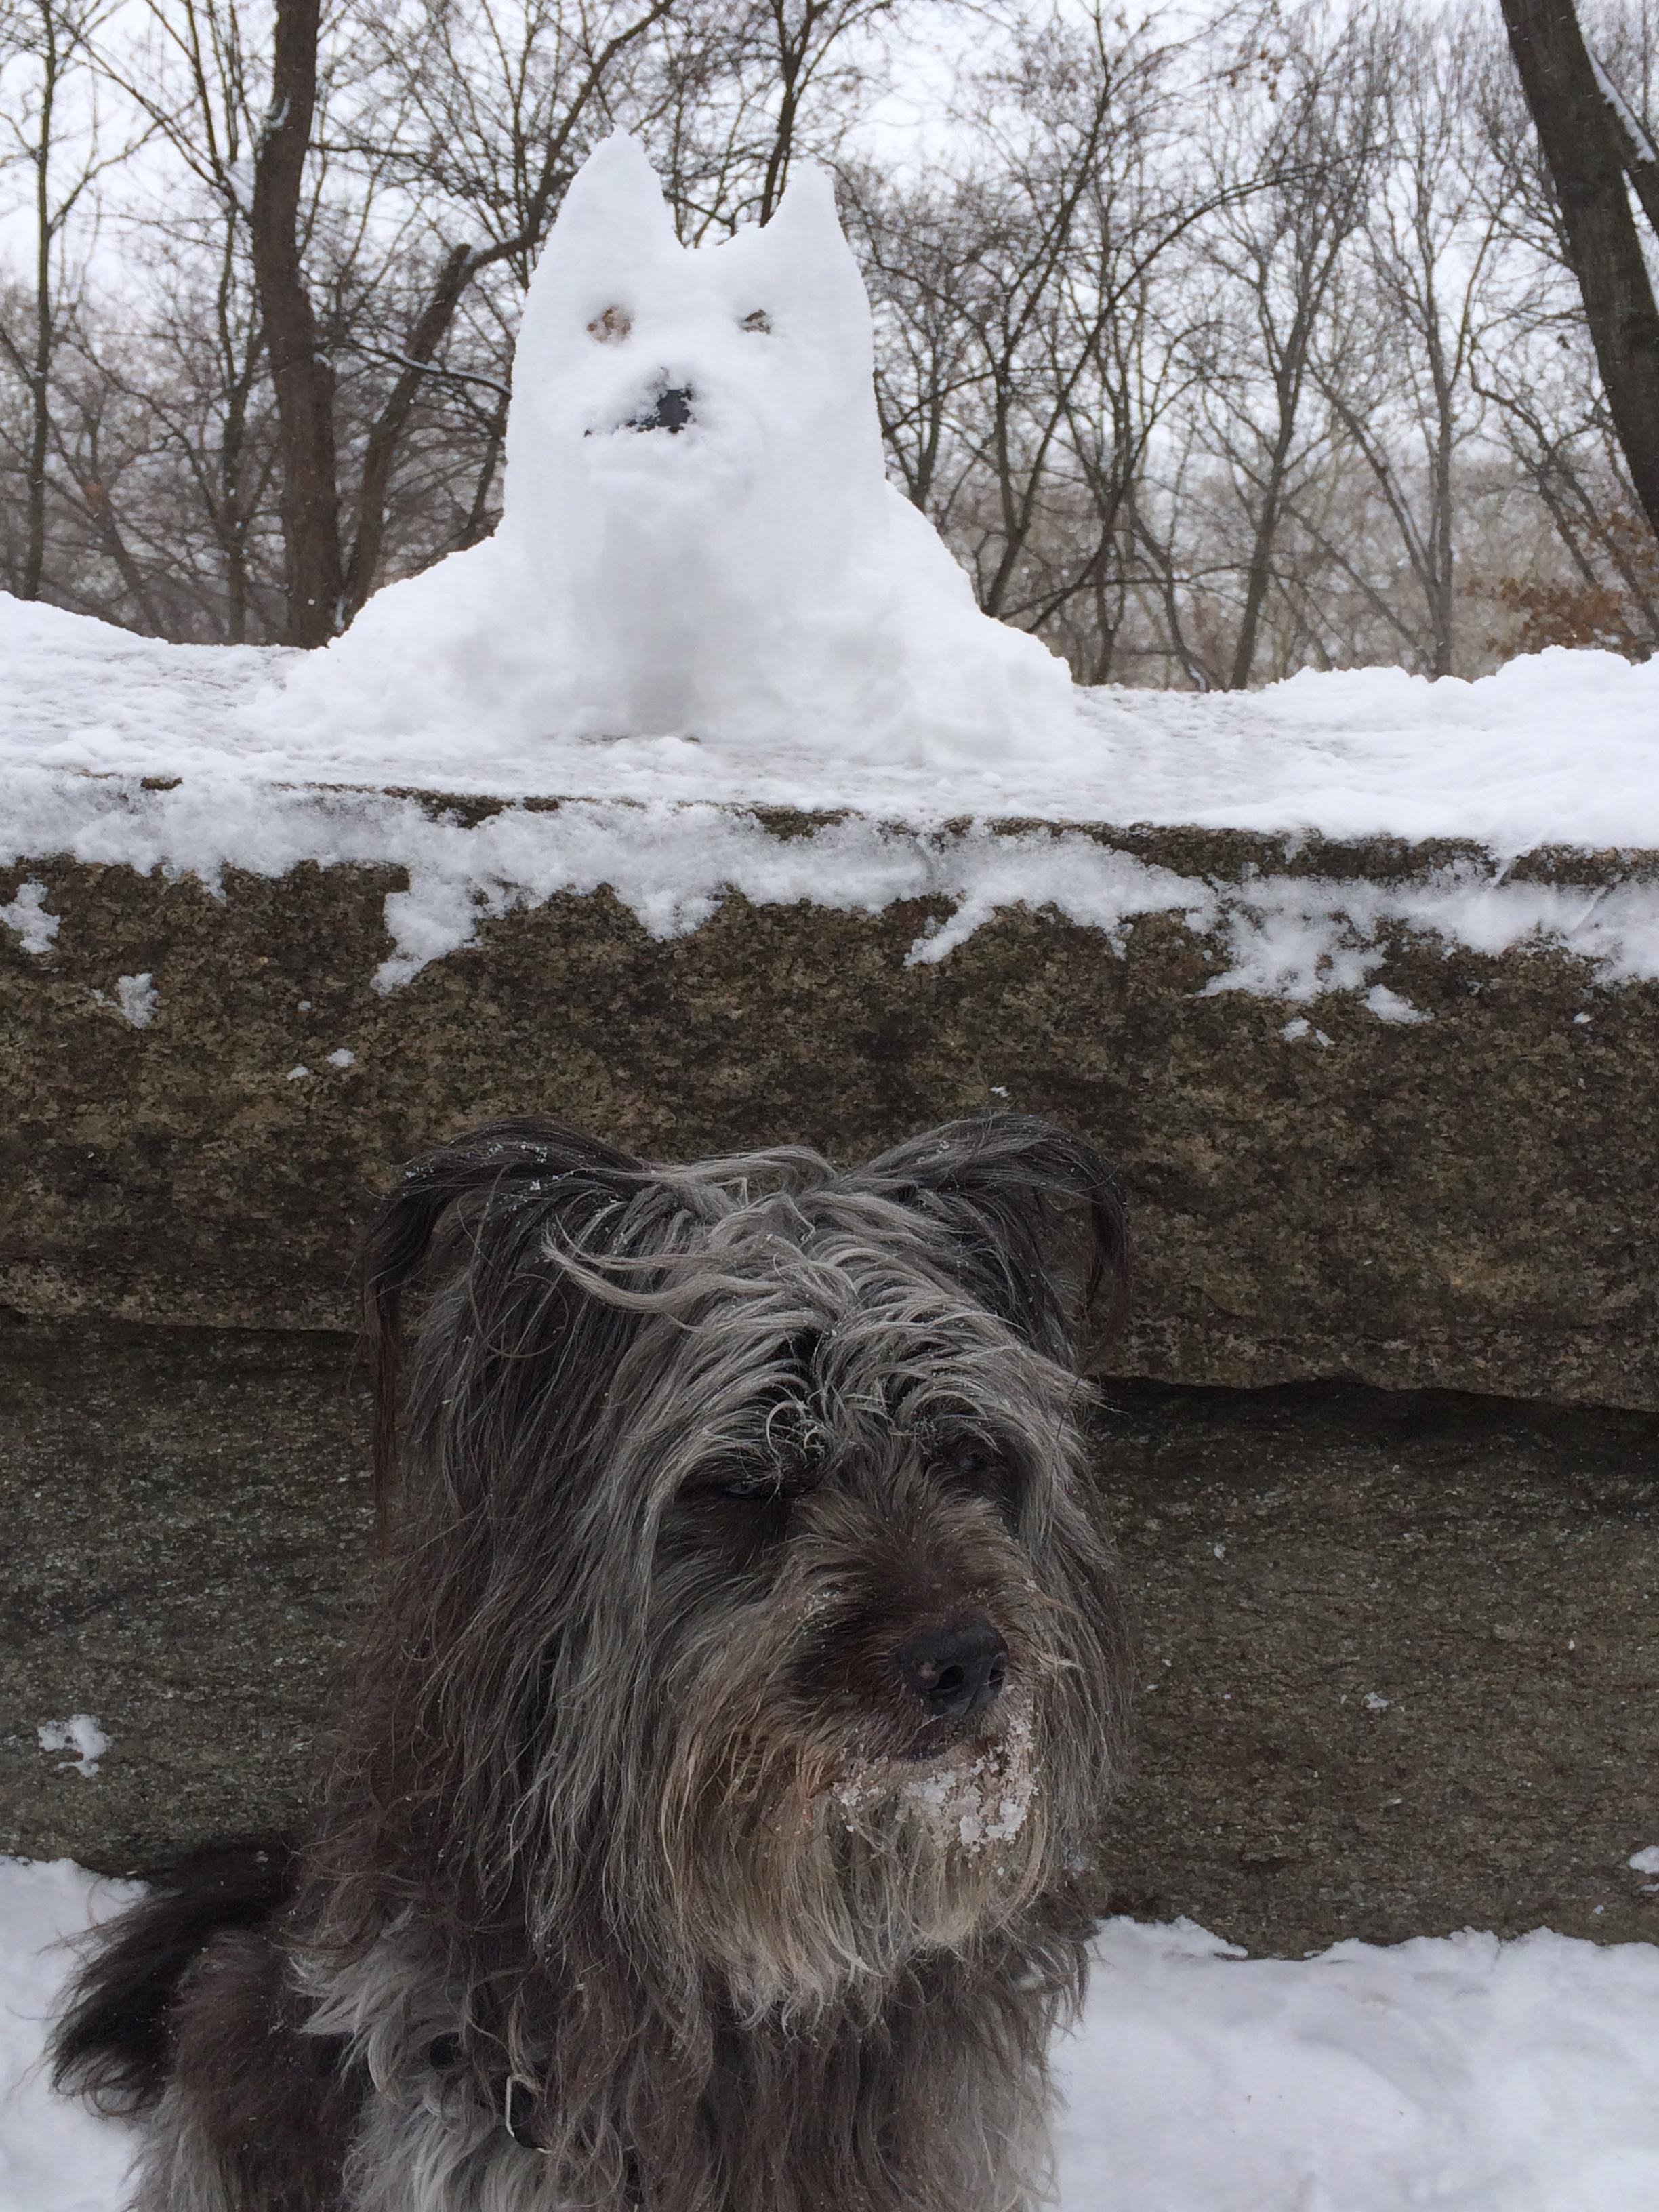 animals made of snow - photo #6